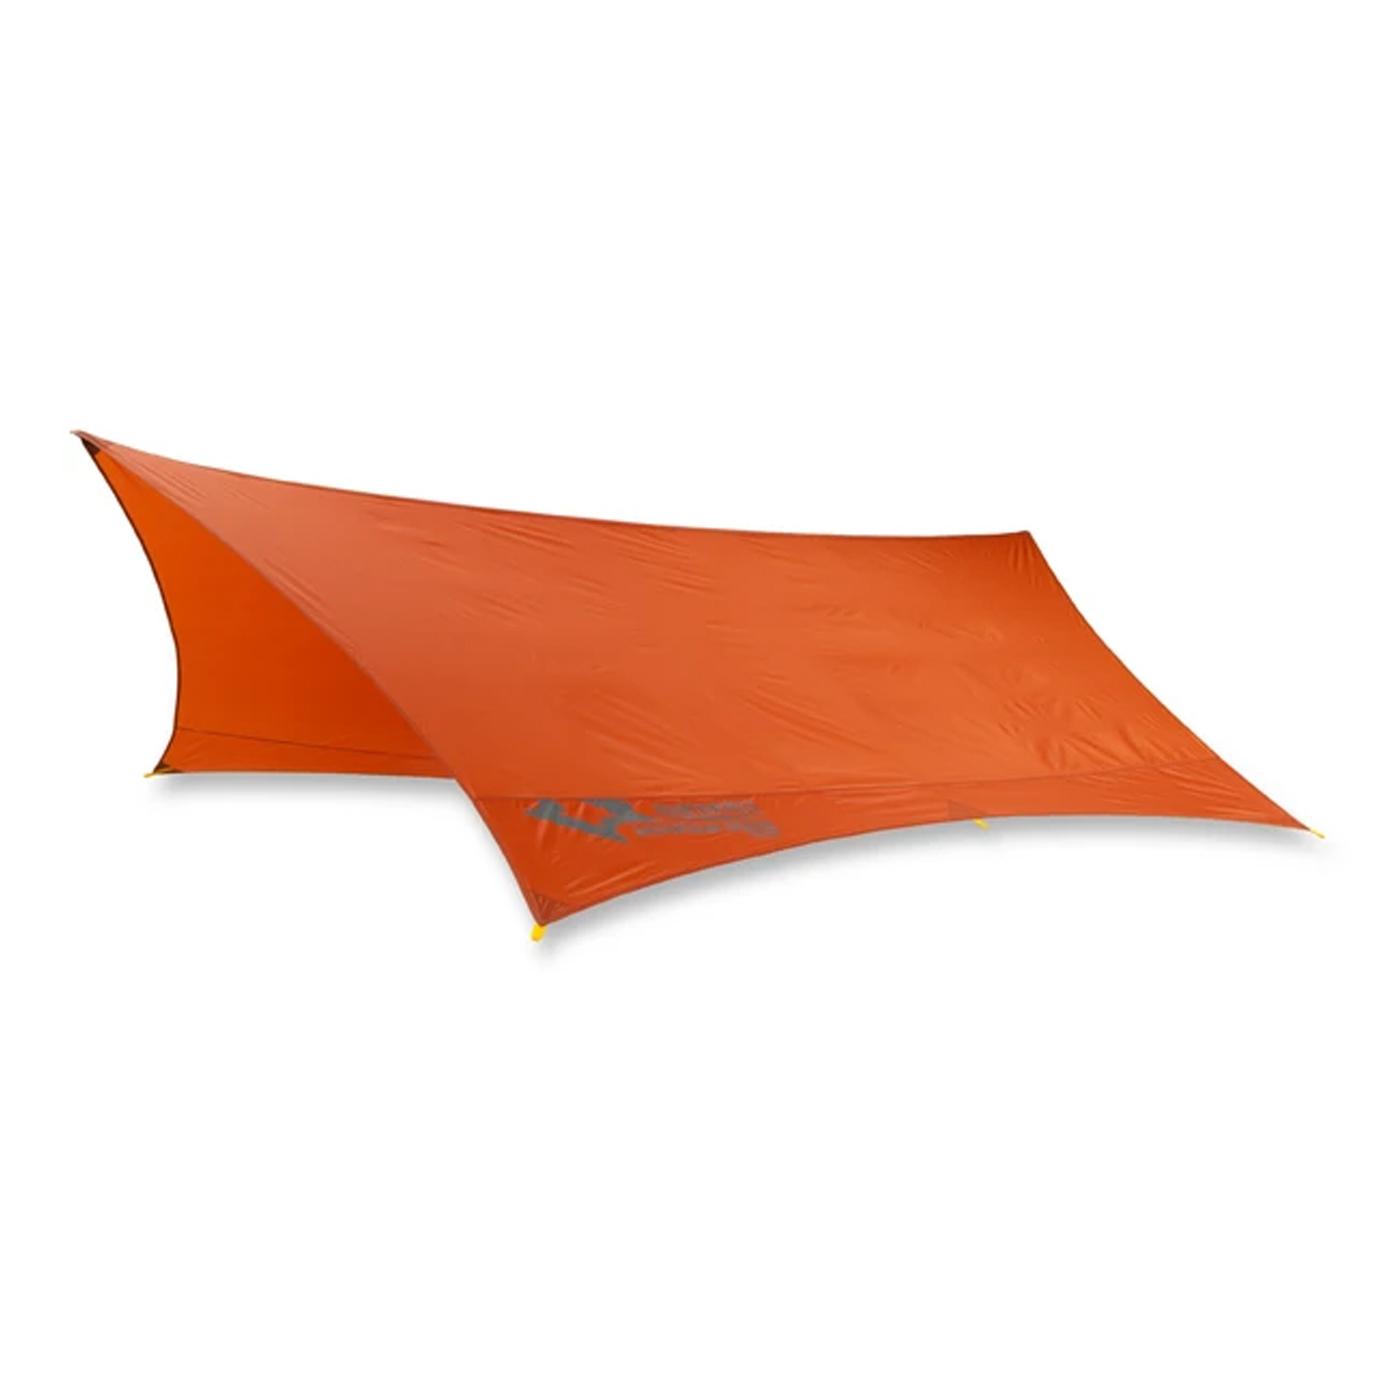 product: MOUNTAIN SHADE TARP / color: ORANGE 2